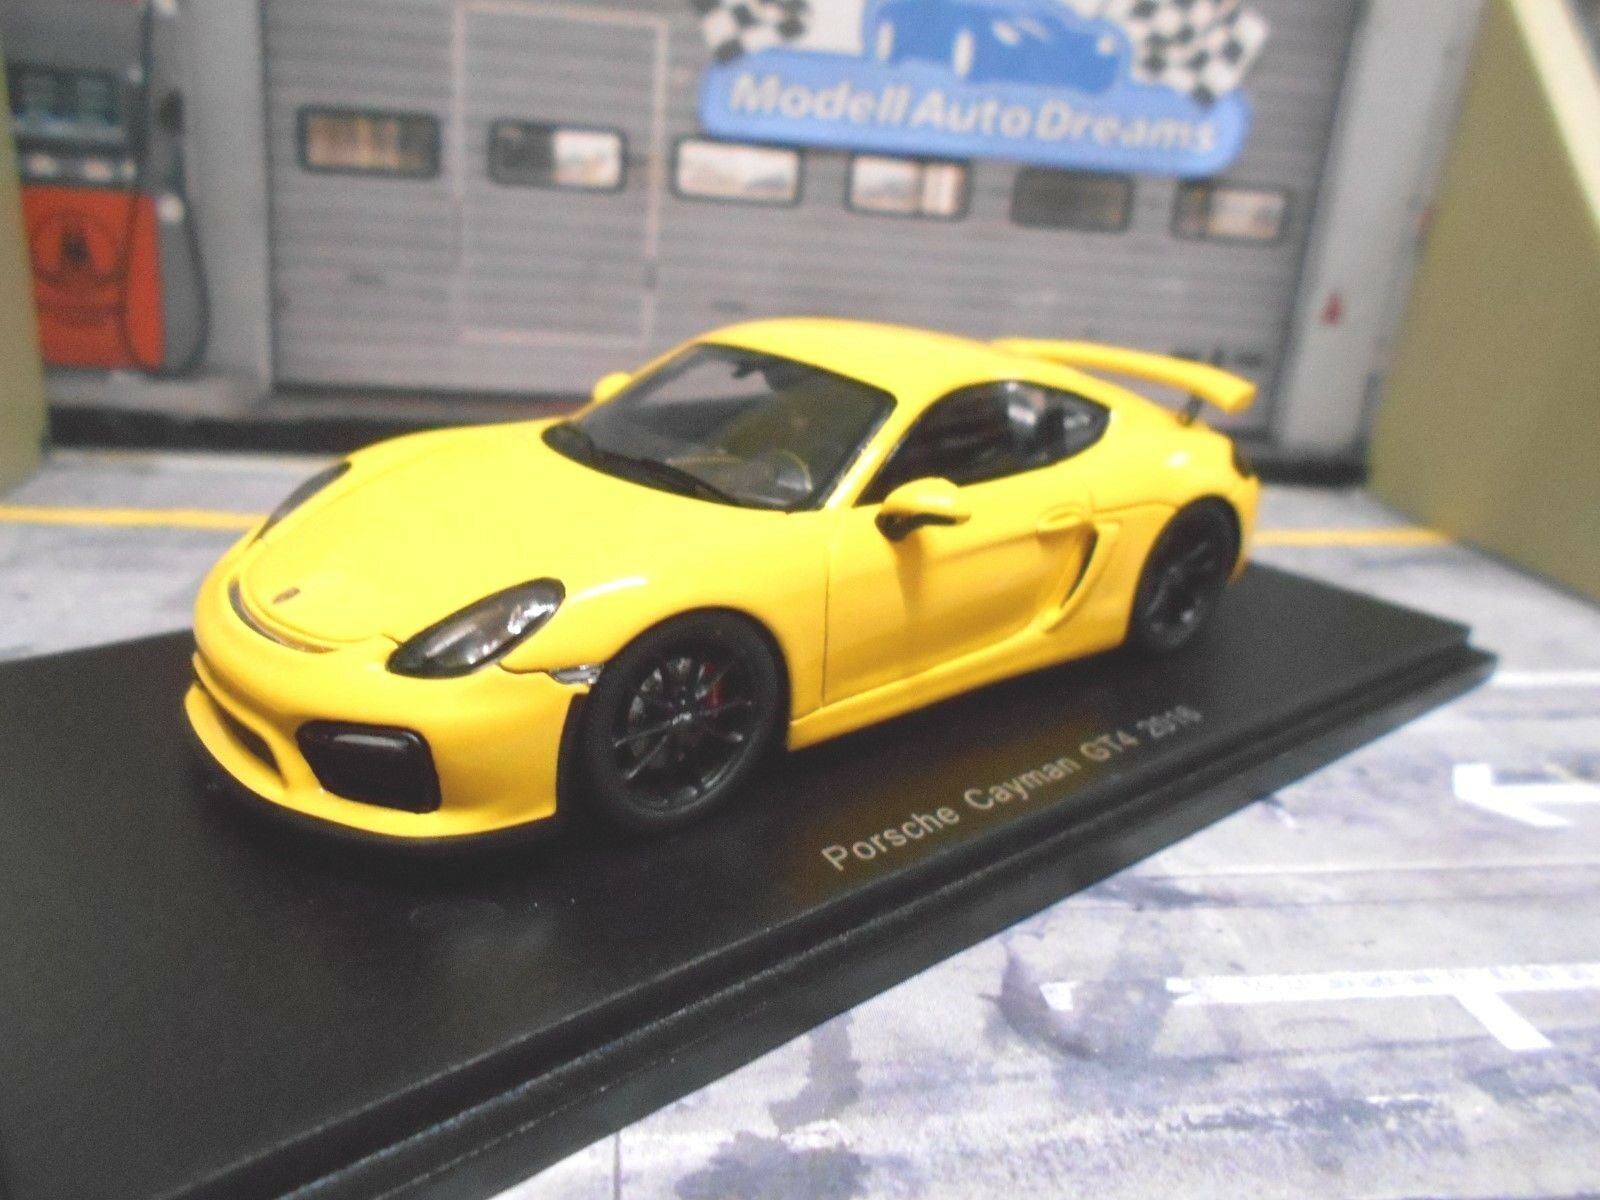 PORSCHE Cayman GT4 Coupe 2016 yellow yellow Resin Highend Spark 1 43